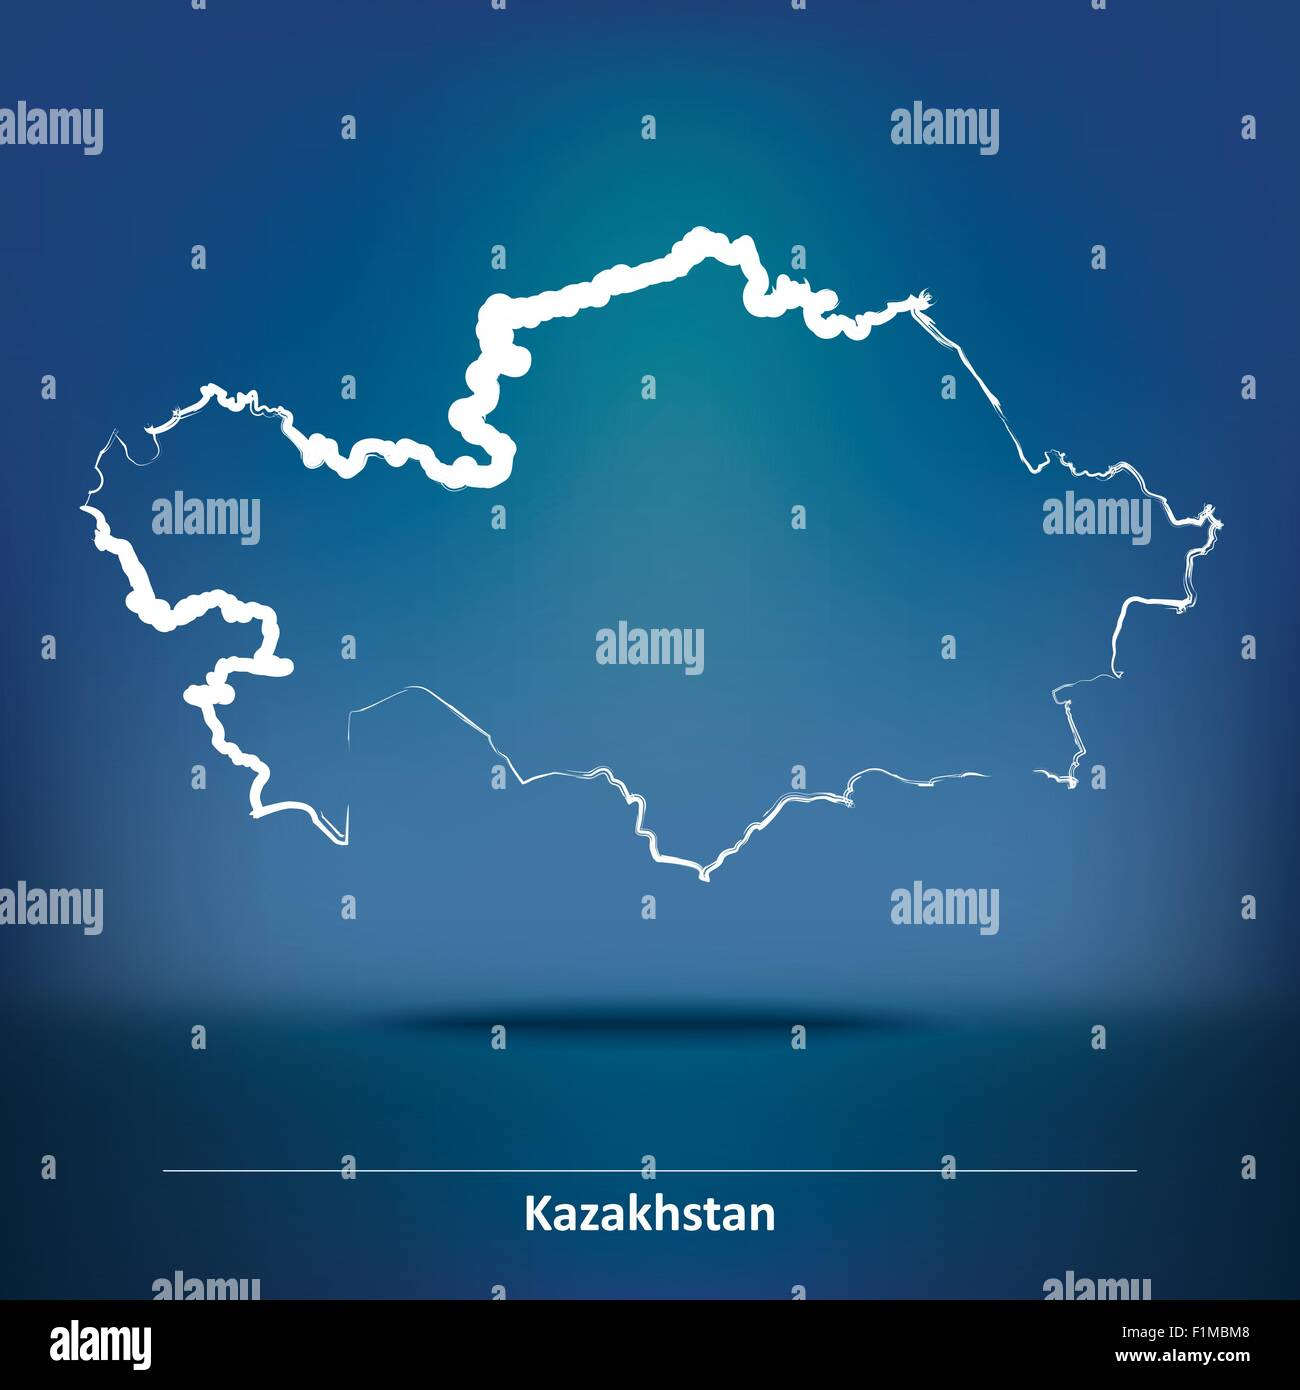 Doodle Map of Kazakhstan - vector illustration - Stock Vector